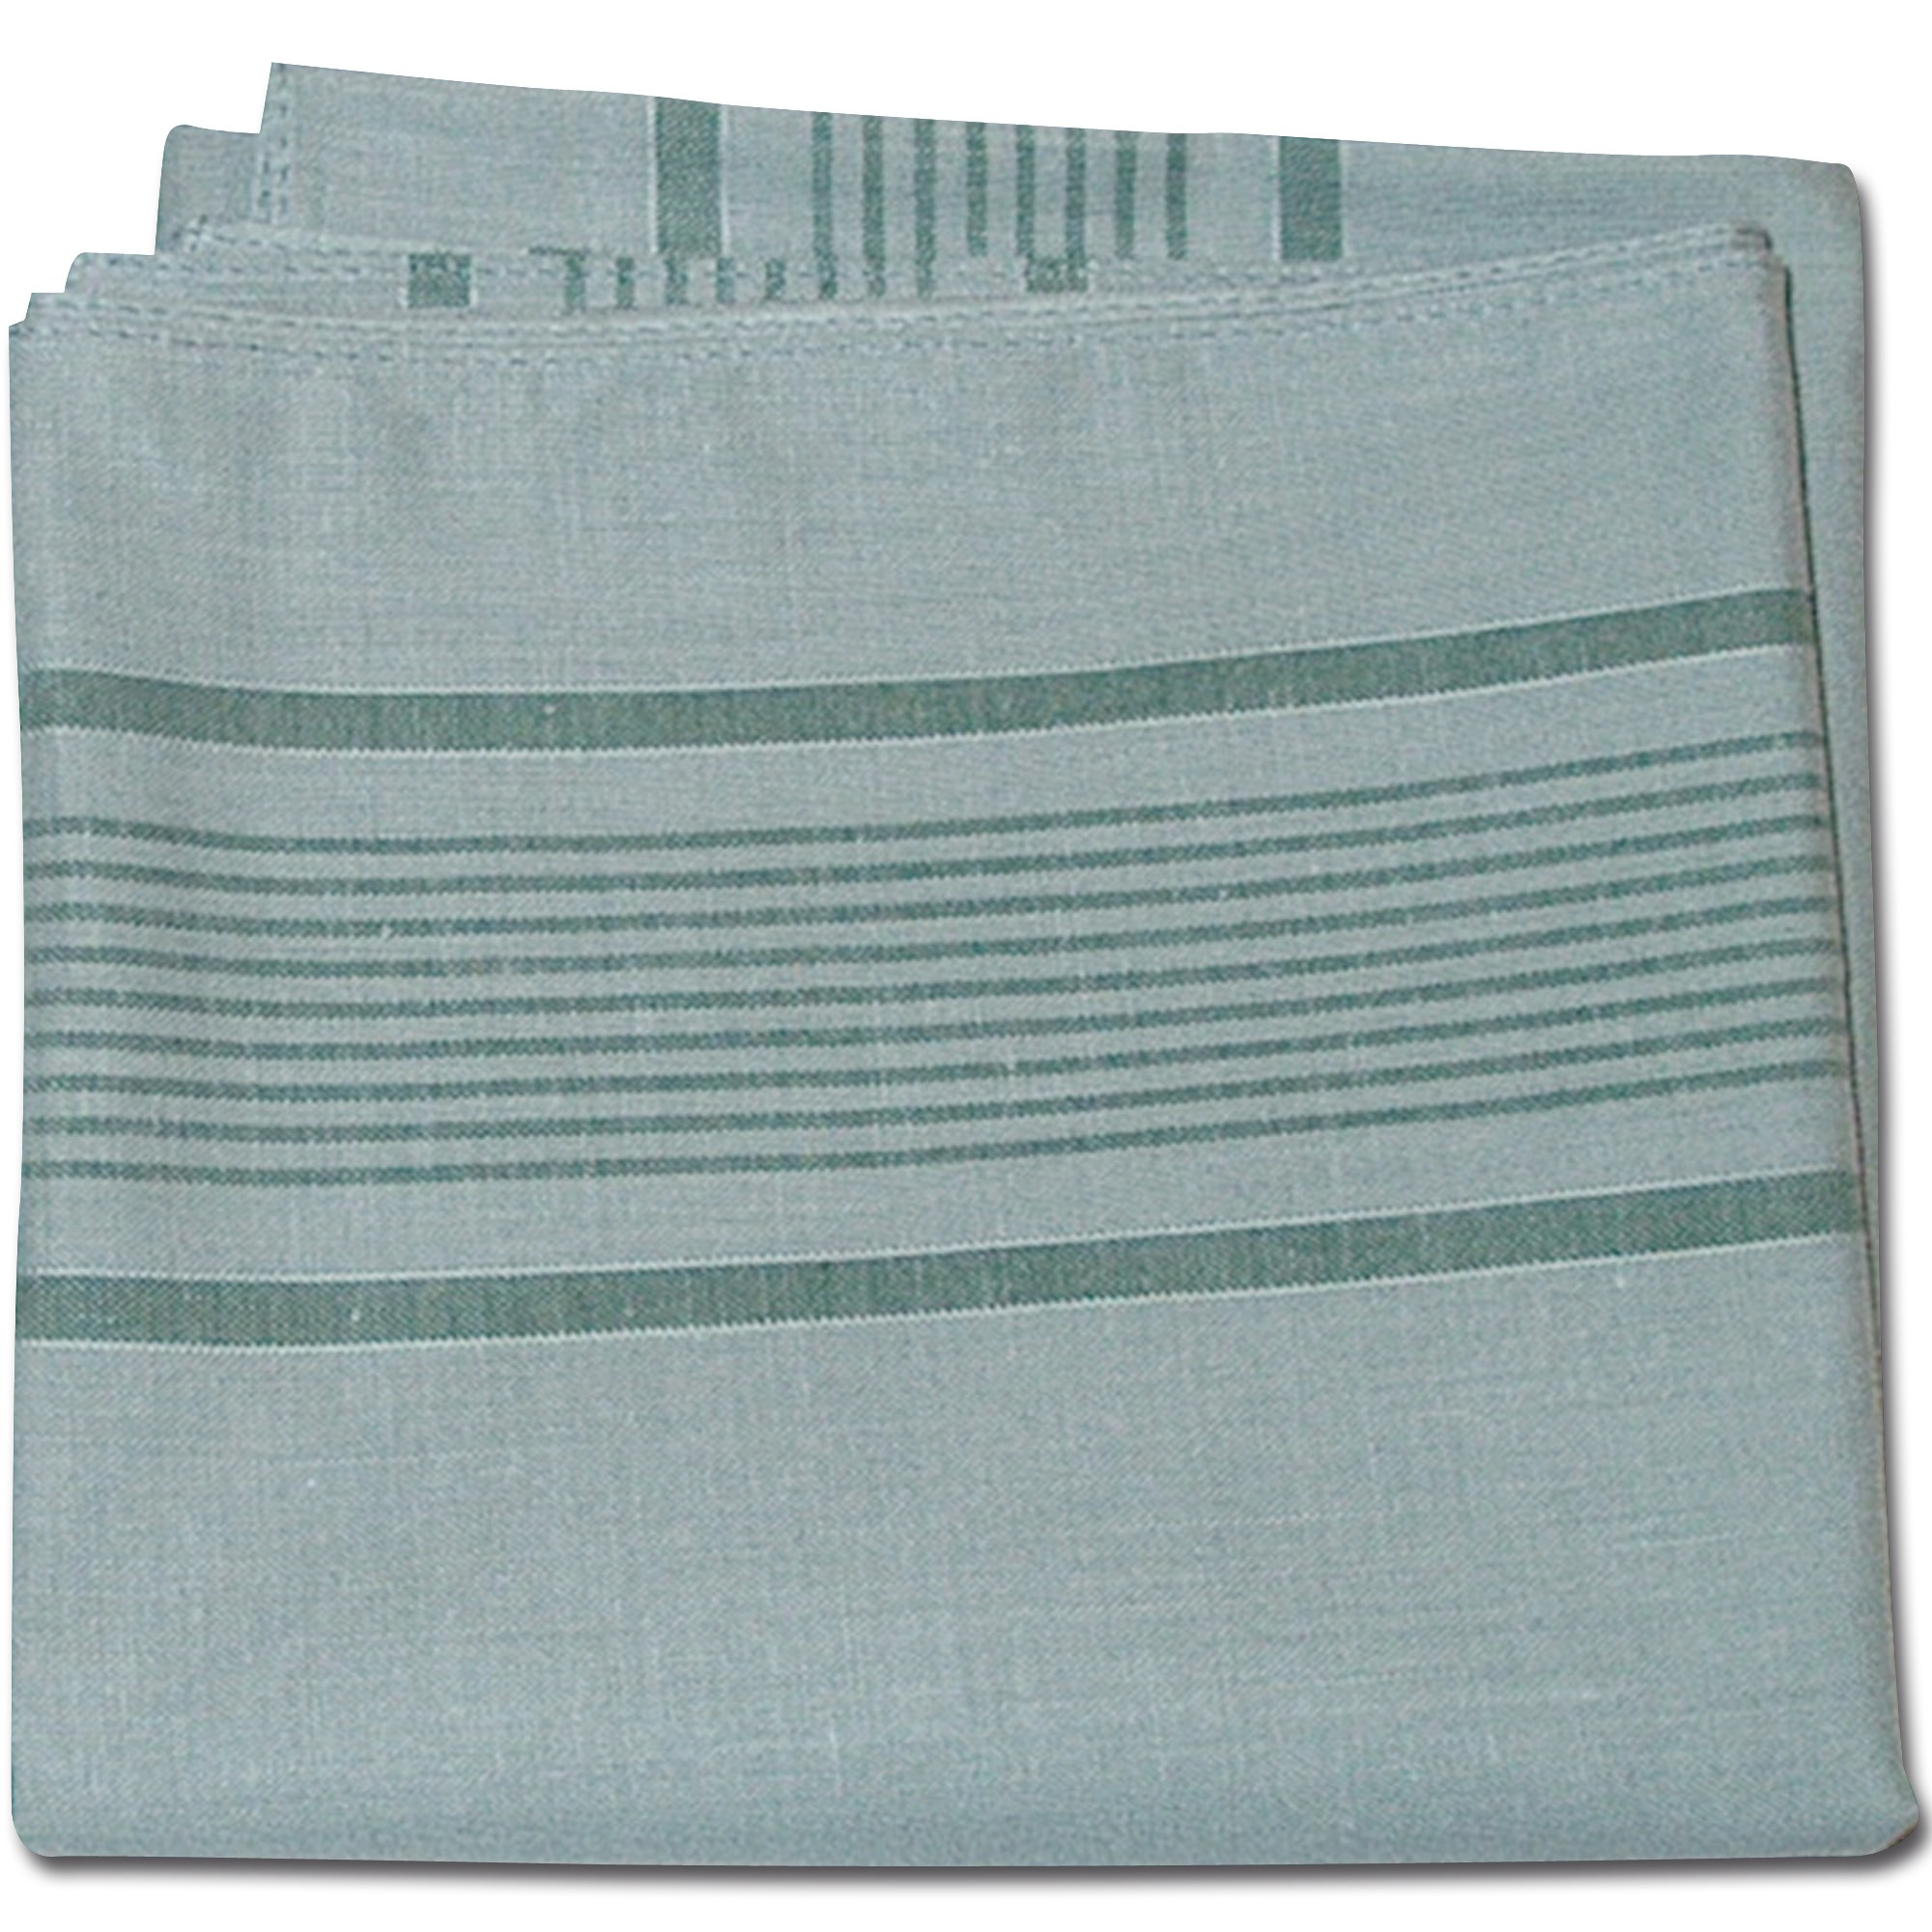 BW Handkerchief